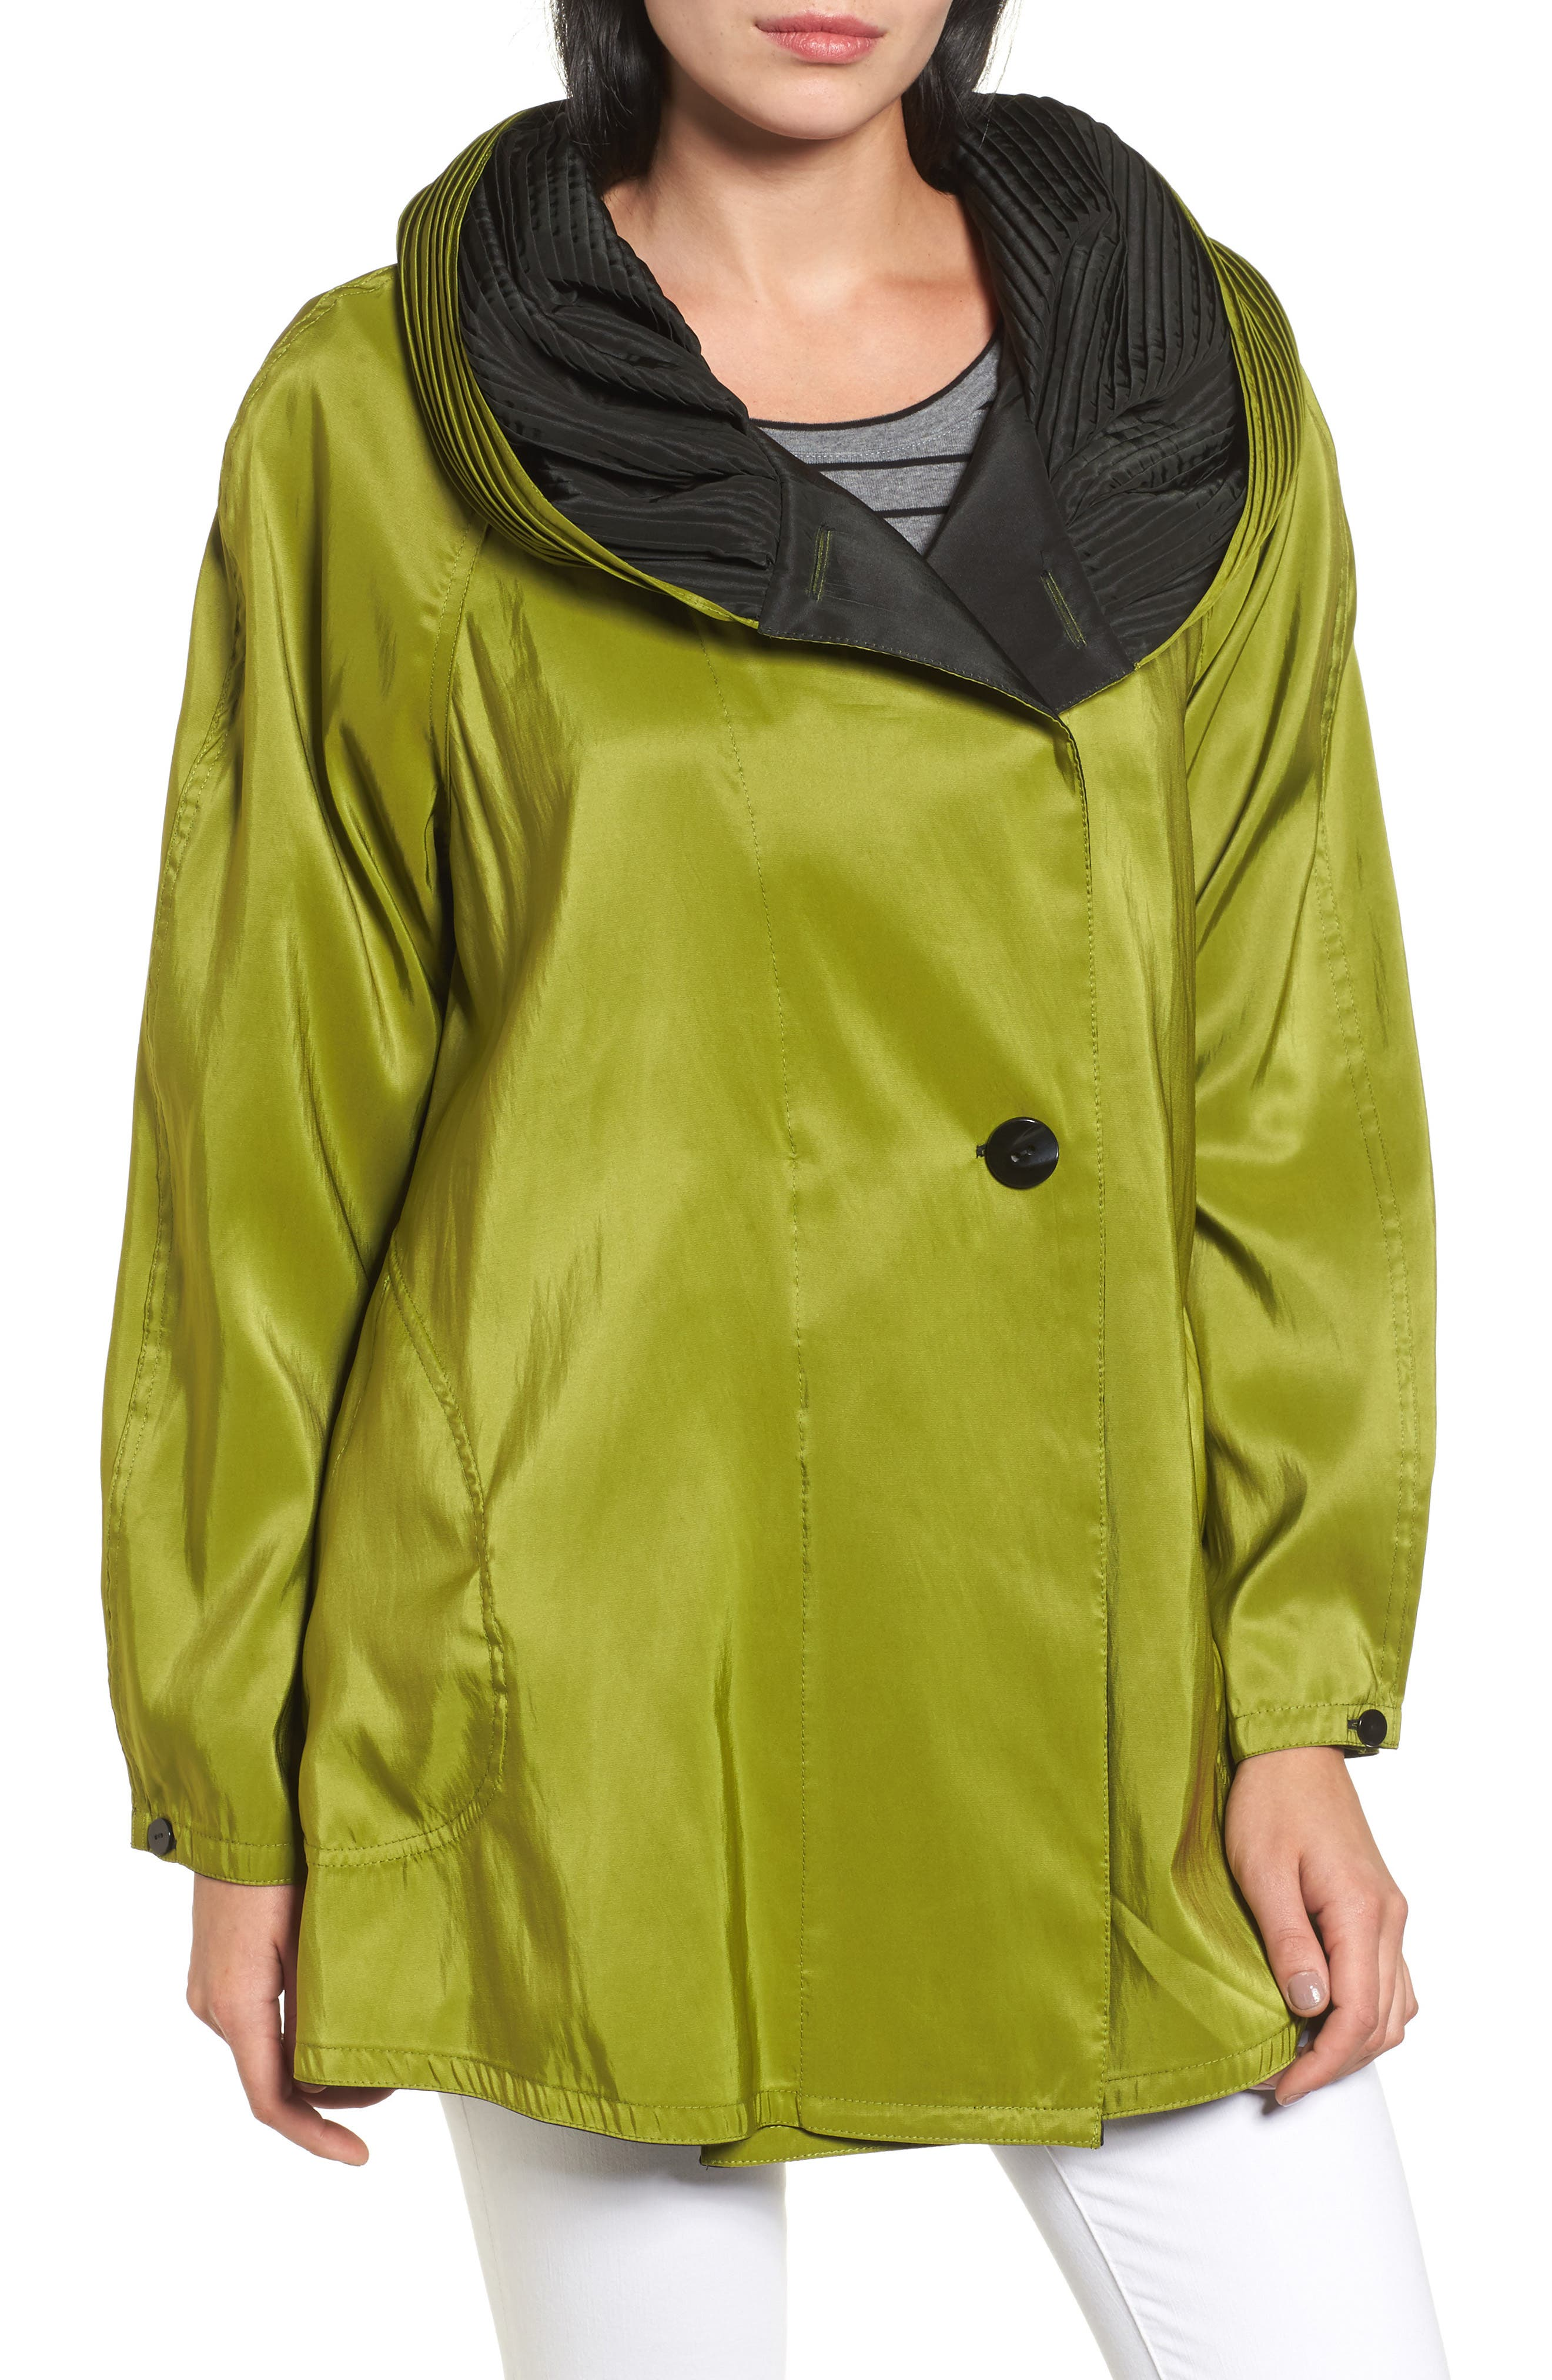 'Mini Donatella' Reversible Pleat Hood Packable Travel Coat,                             Main thumbnail 1, color,                             316